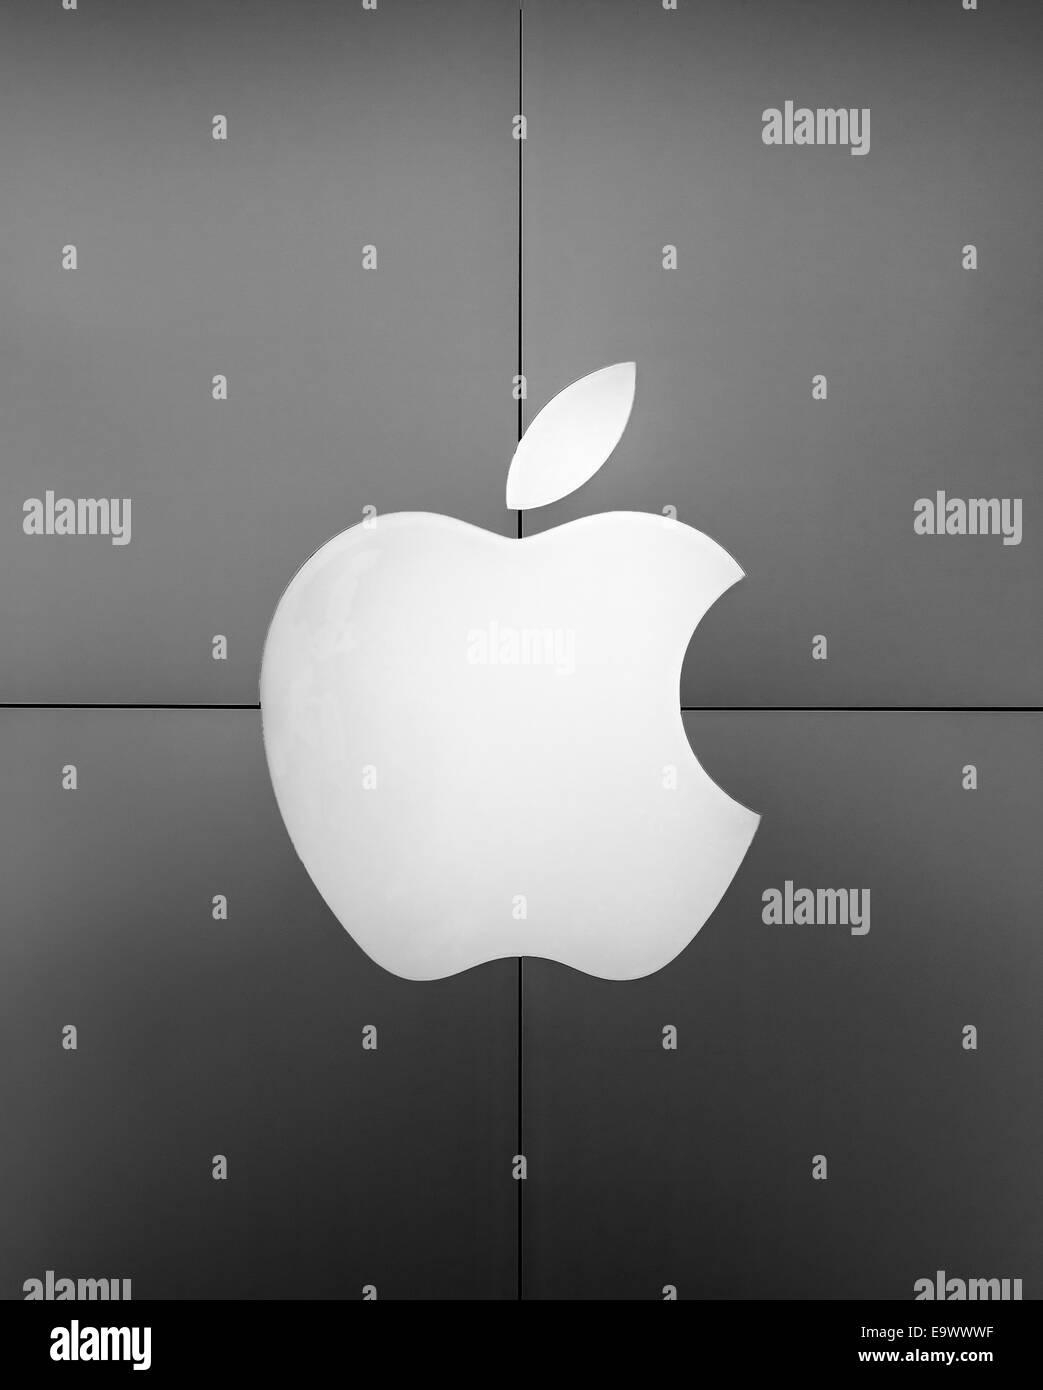 Exterior of an Apple Store with logo, Ardmore, Pennsylvania, USA Stock Photo